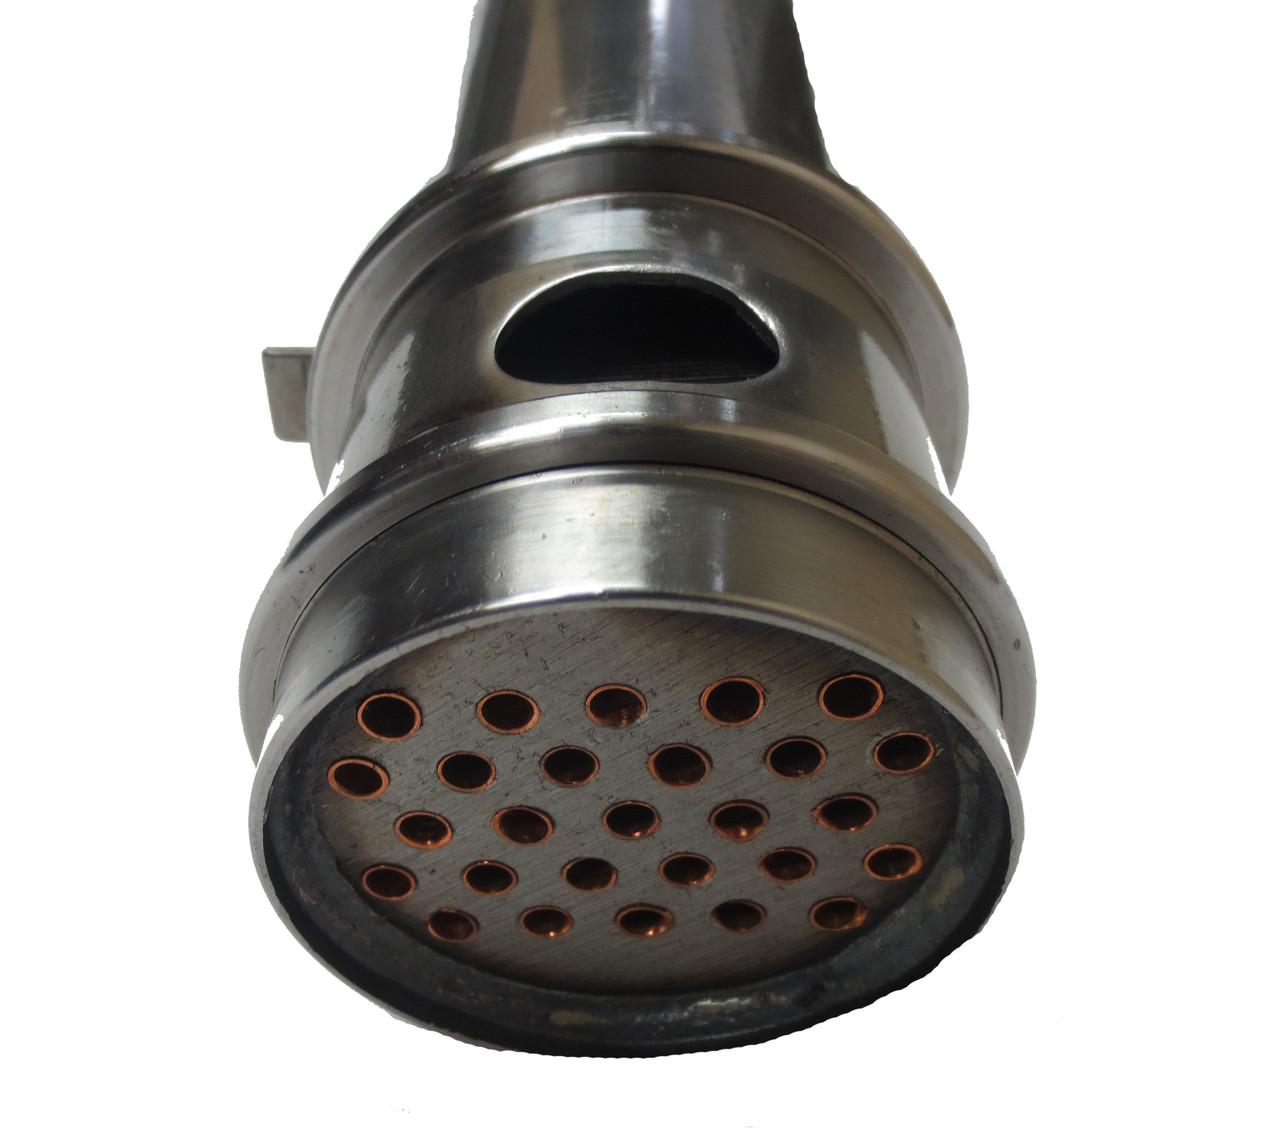 Oil Cooler /& Gaskets 1815904C2 for Navistar 7.3L Powerstroke DT466 DT530 T444E